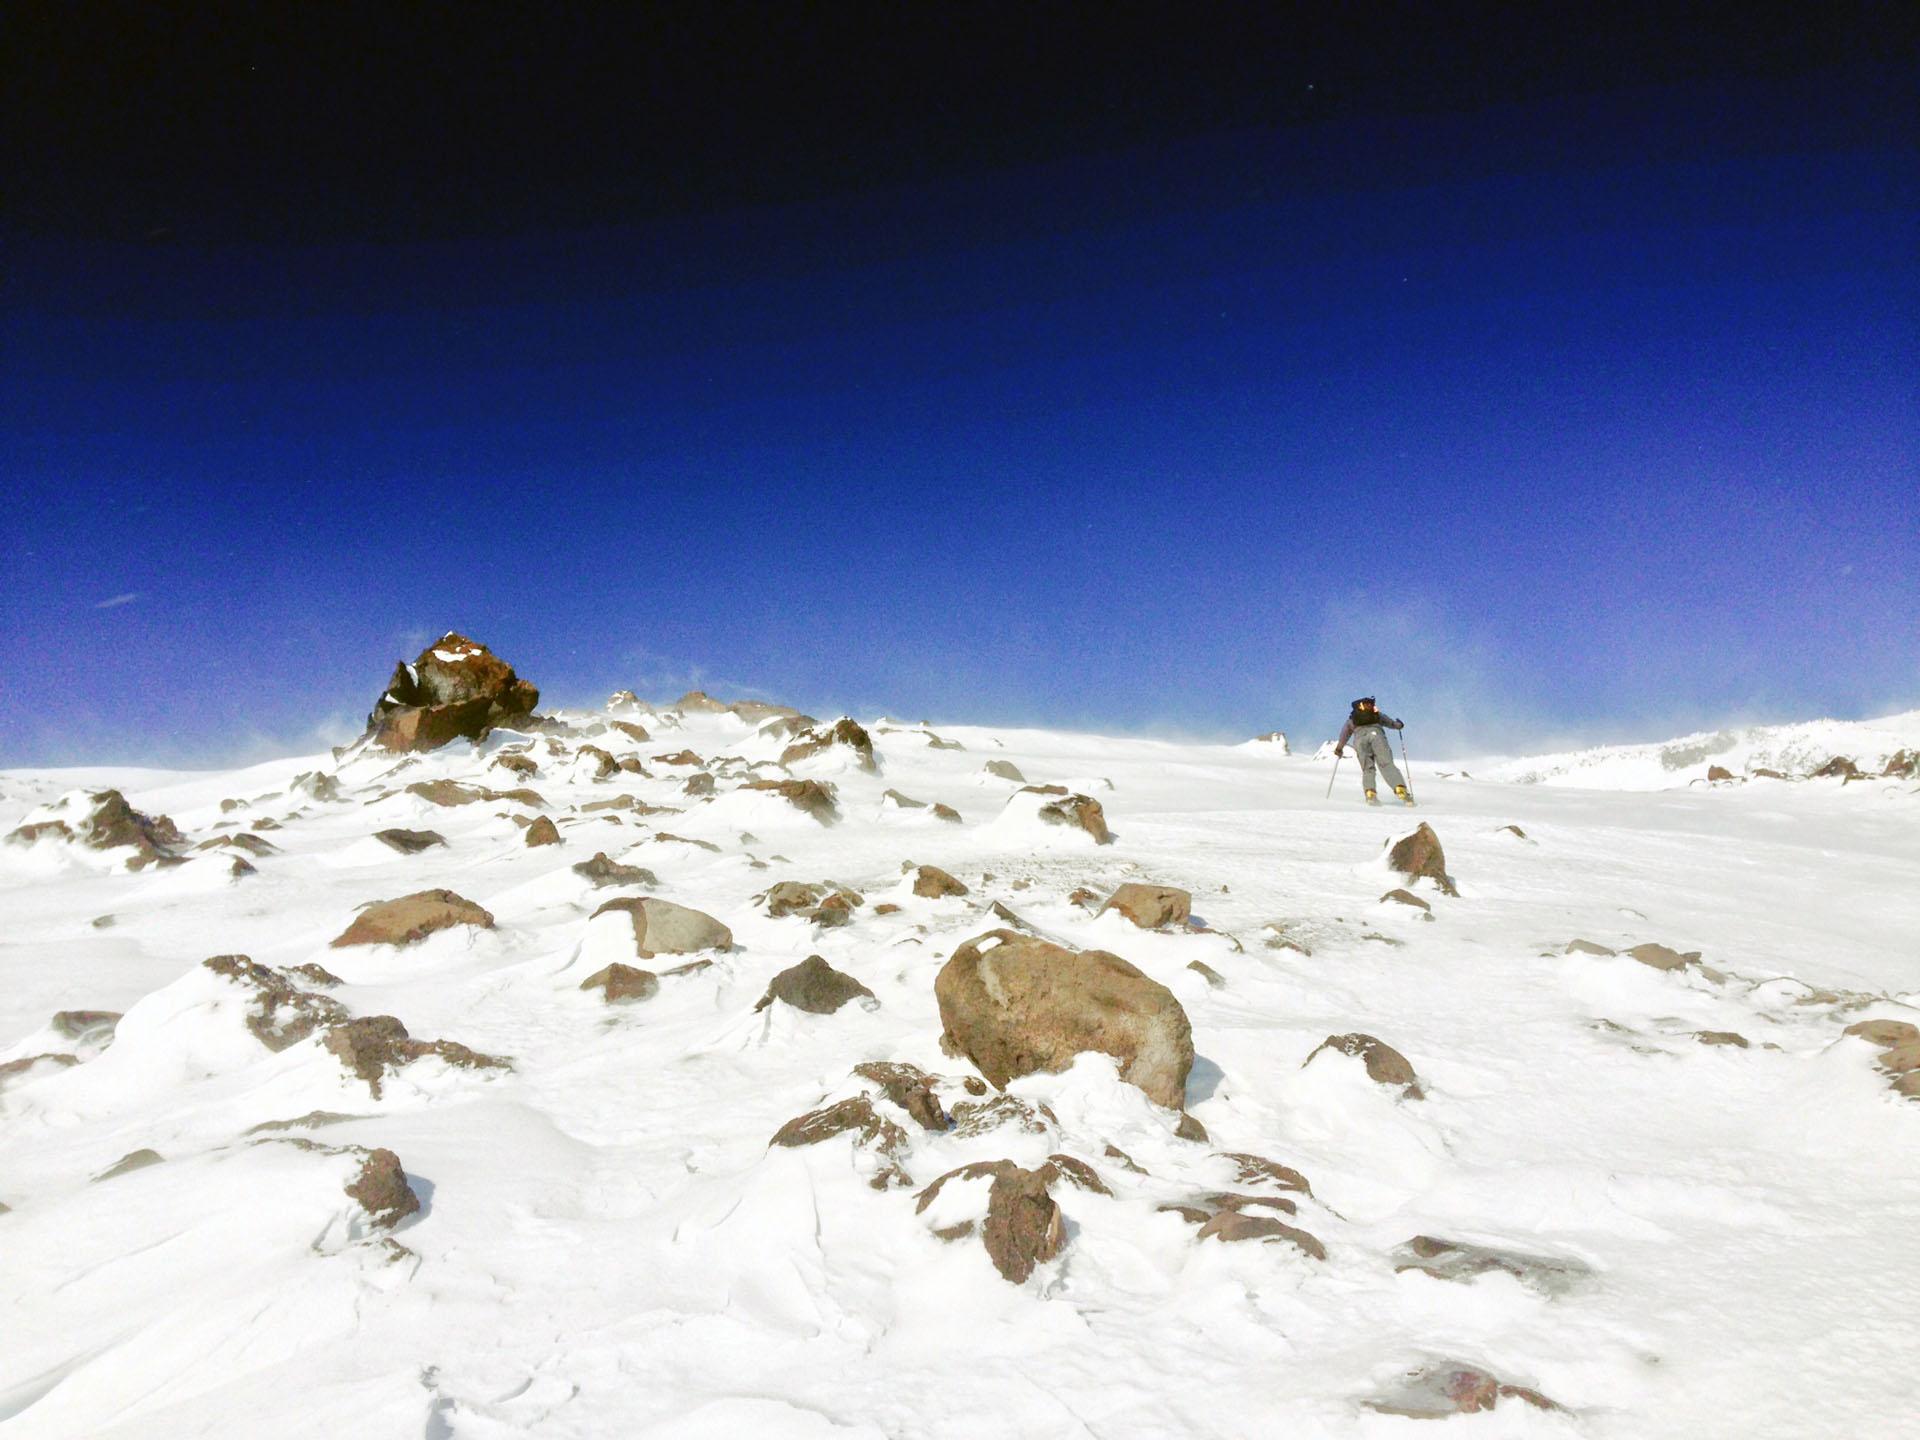 Wormflows Route - Mt. St. Helens - Dec 2014